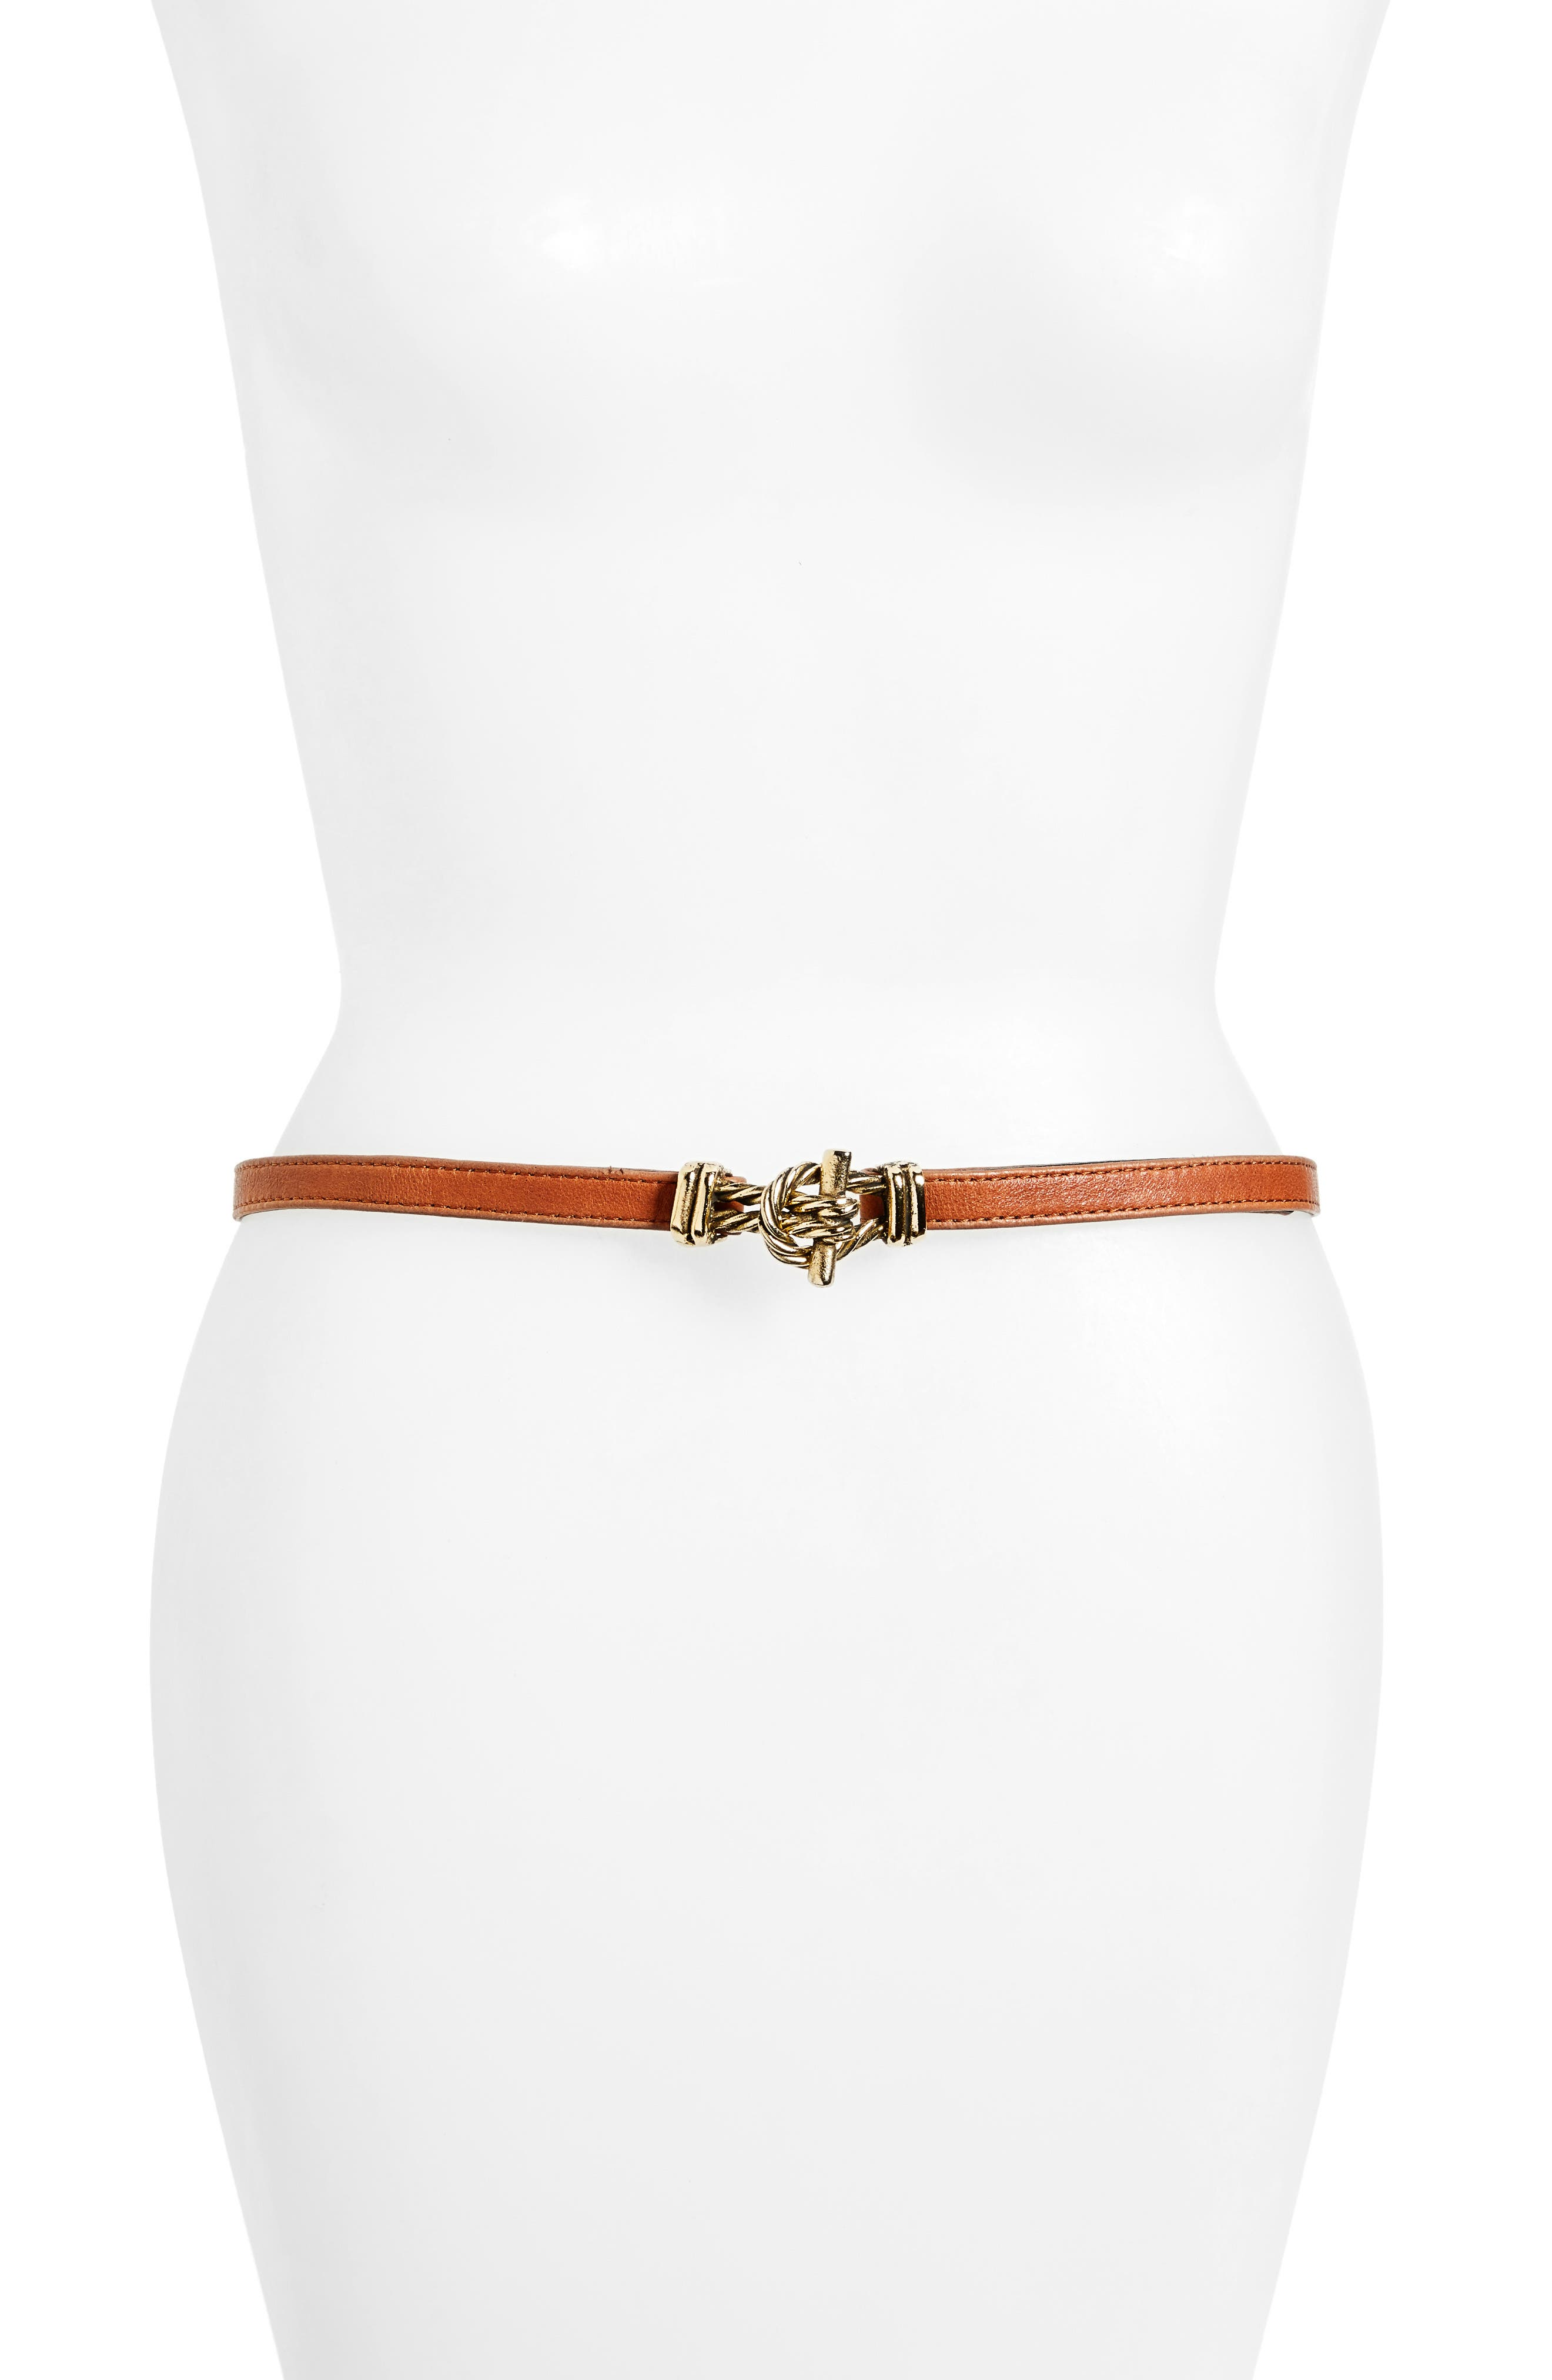 Main Image - Raina Fitzgerald Leather Belt